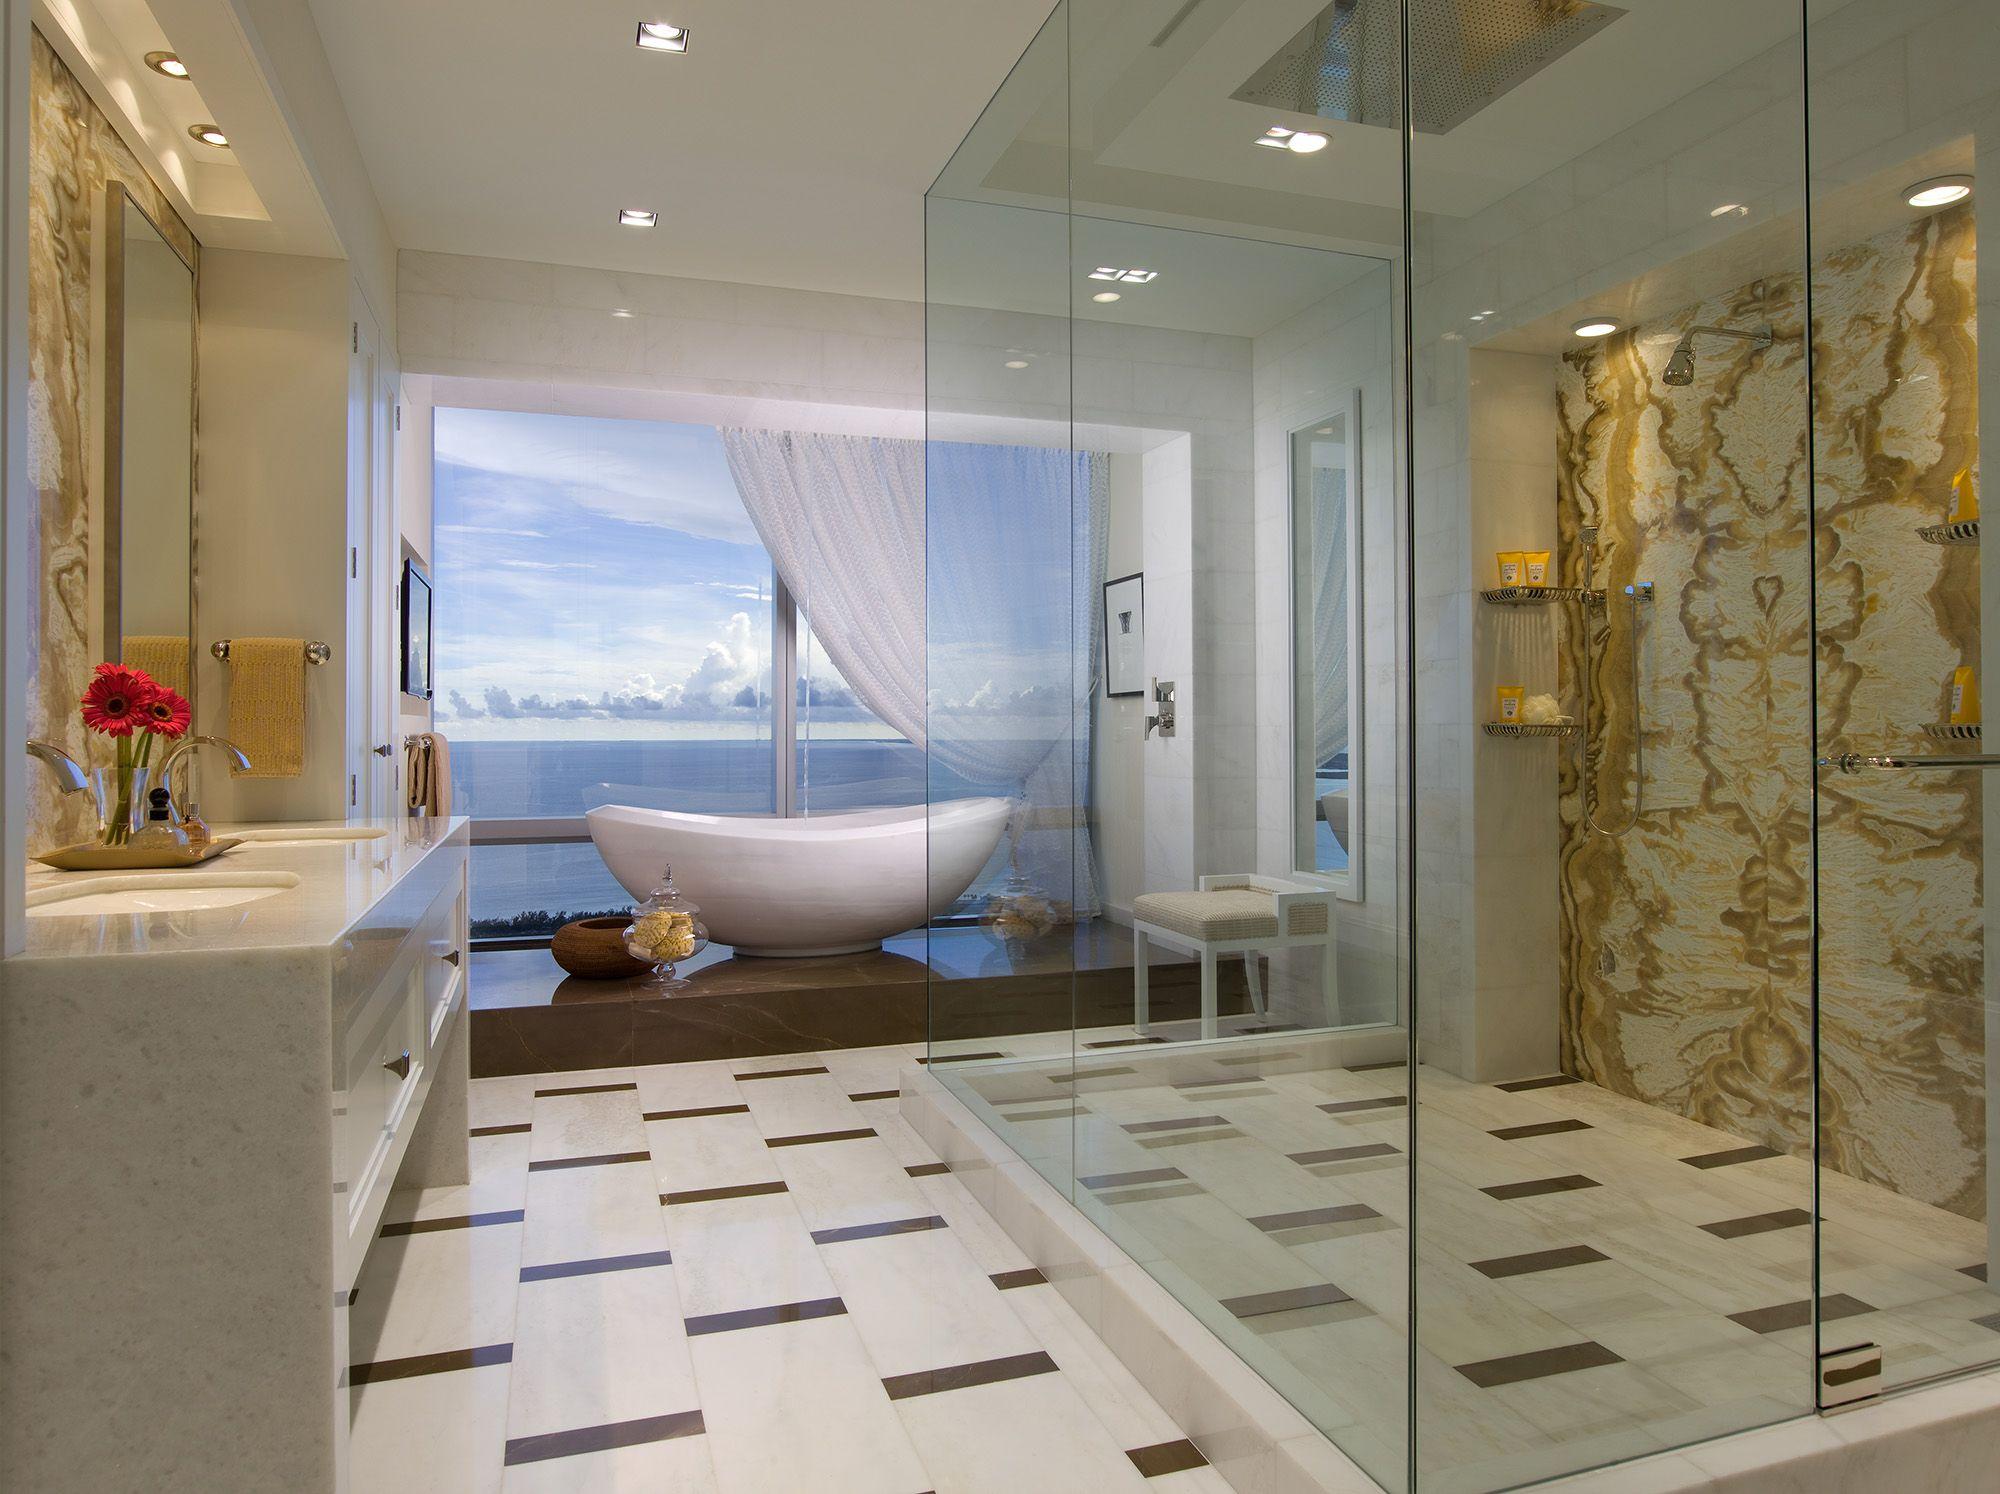 Bathroom Design Miami four seasons miami-residence master bathroom #opustone